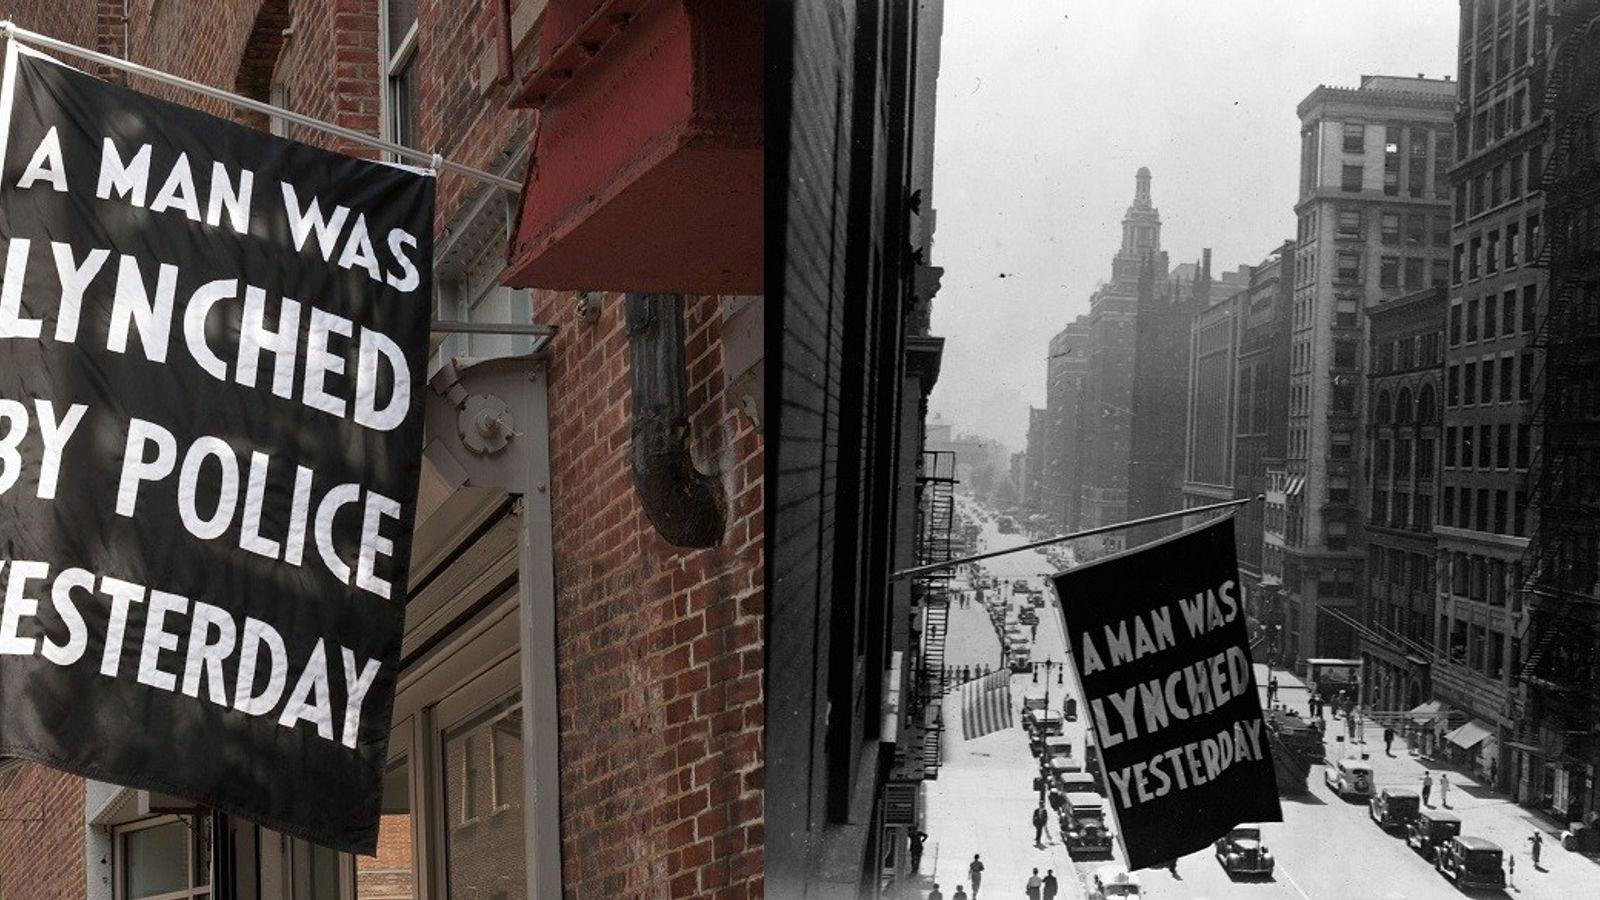 Left: Von 1920 bis 1938 ließ die National Association for the Advancement of Colored People vor ihrem ...